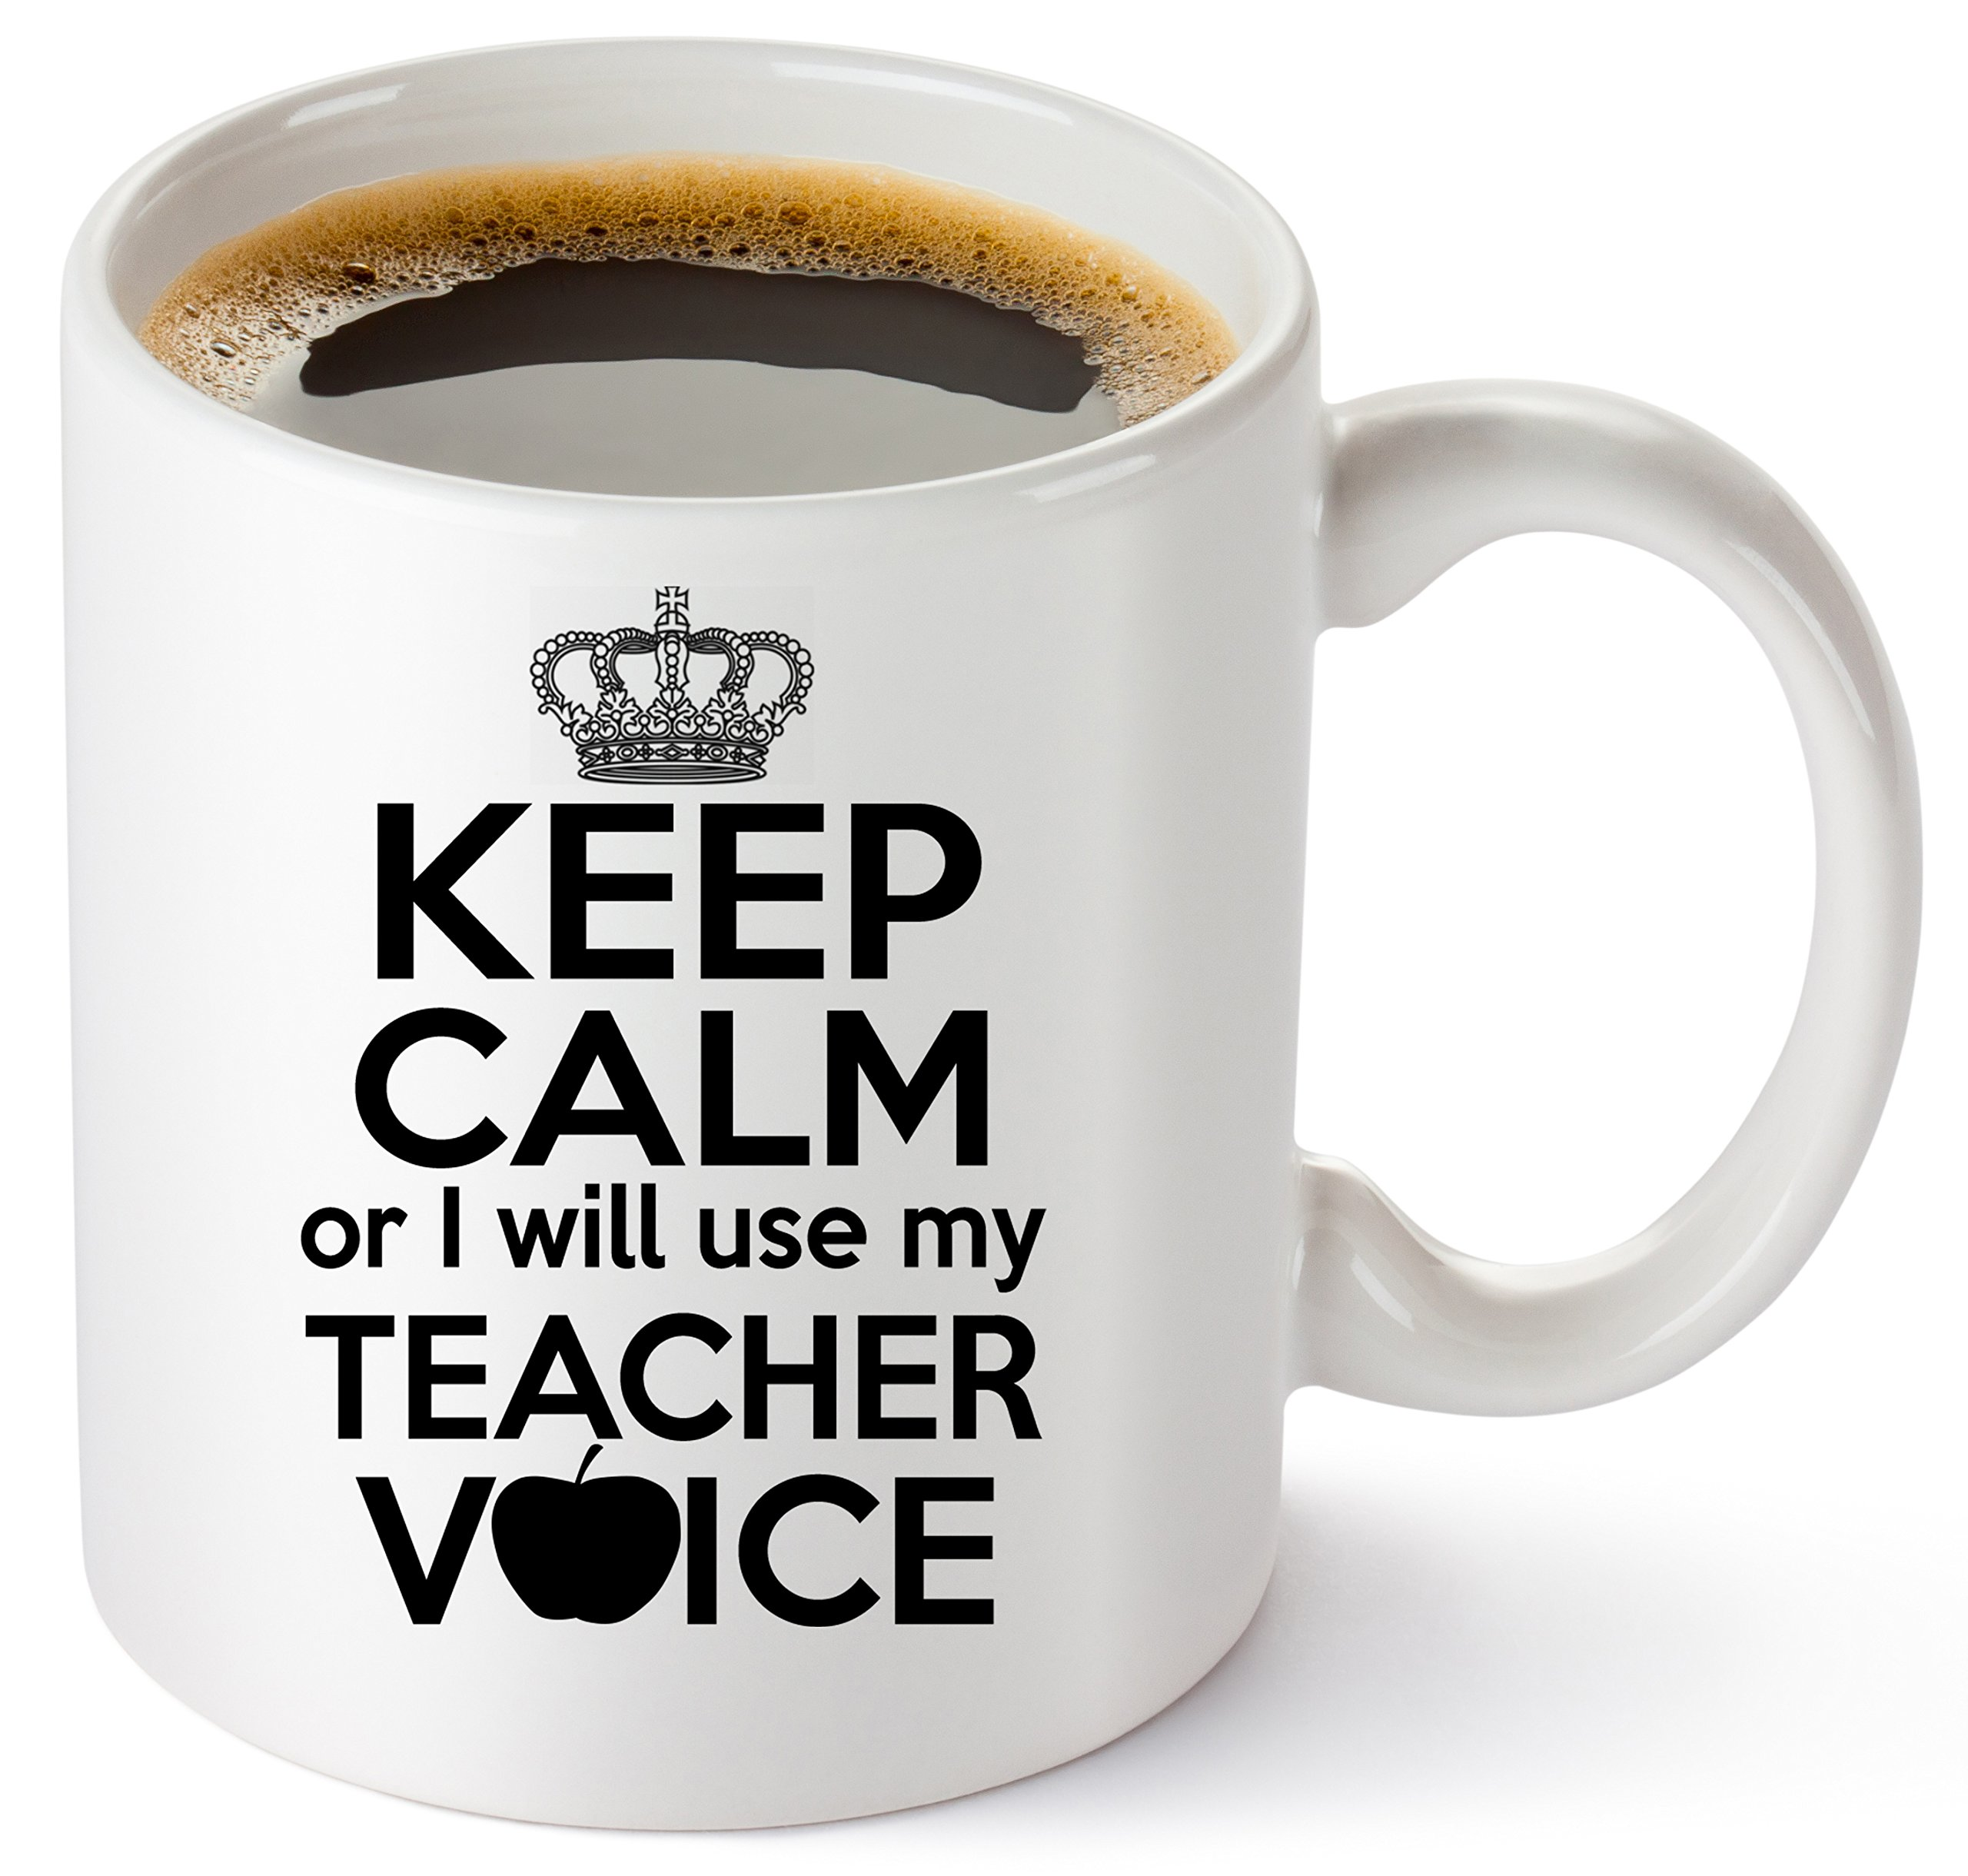 Teacher Coffee Mug 11oz - Funny Birthday, Christmas, Appreciation, Thank you Gifts For Classroom Teachers. Math, English, Preschool, Spanish, Drama Teacher - Keep Calm Or I Will Use My Teacher Voice!